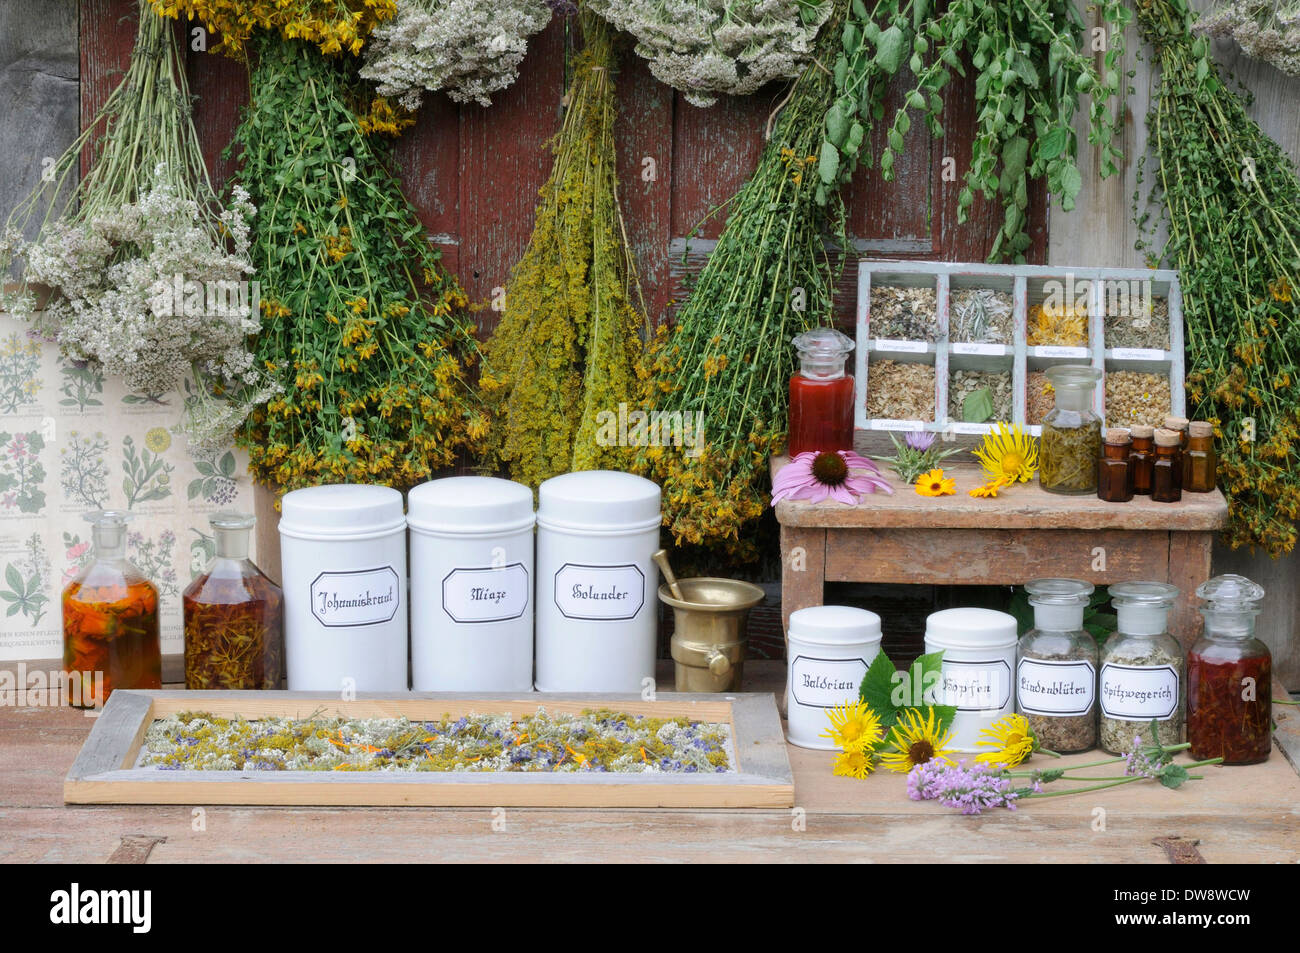 medicinal herbs stockfotos medicinal herbs bilder alamy. Black Bedroom Furniture Sets. Home Design Ideas